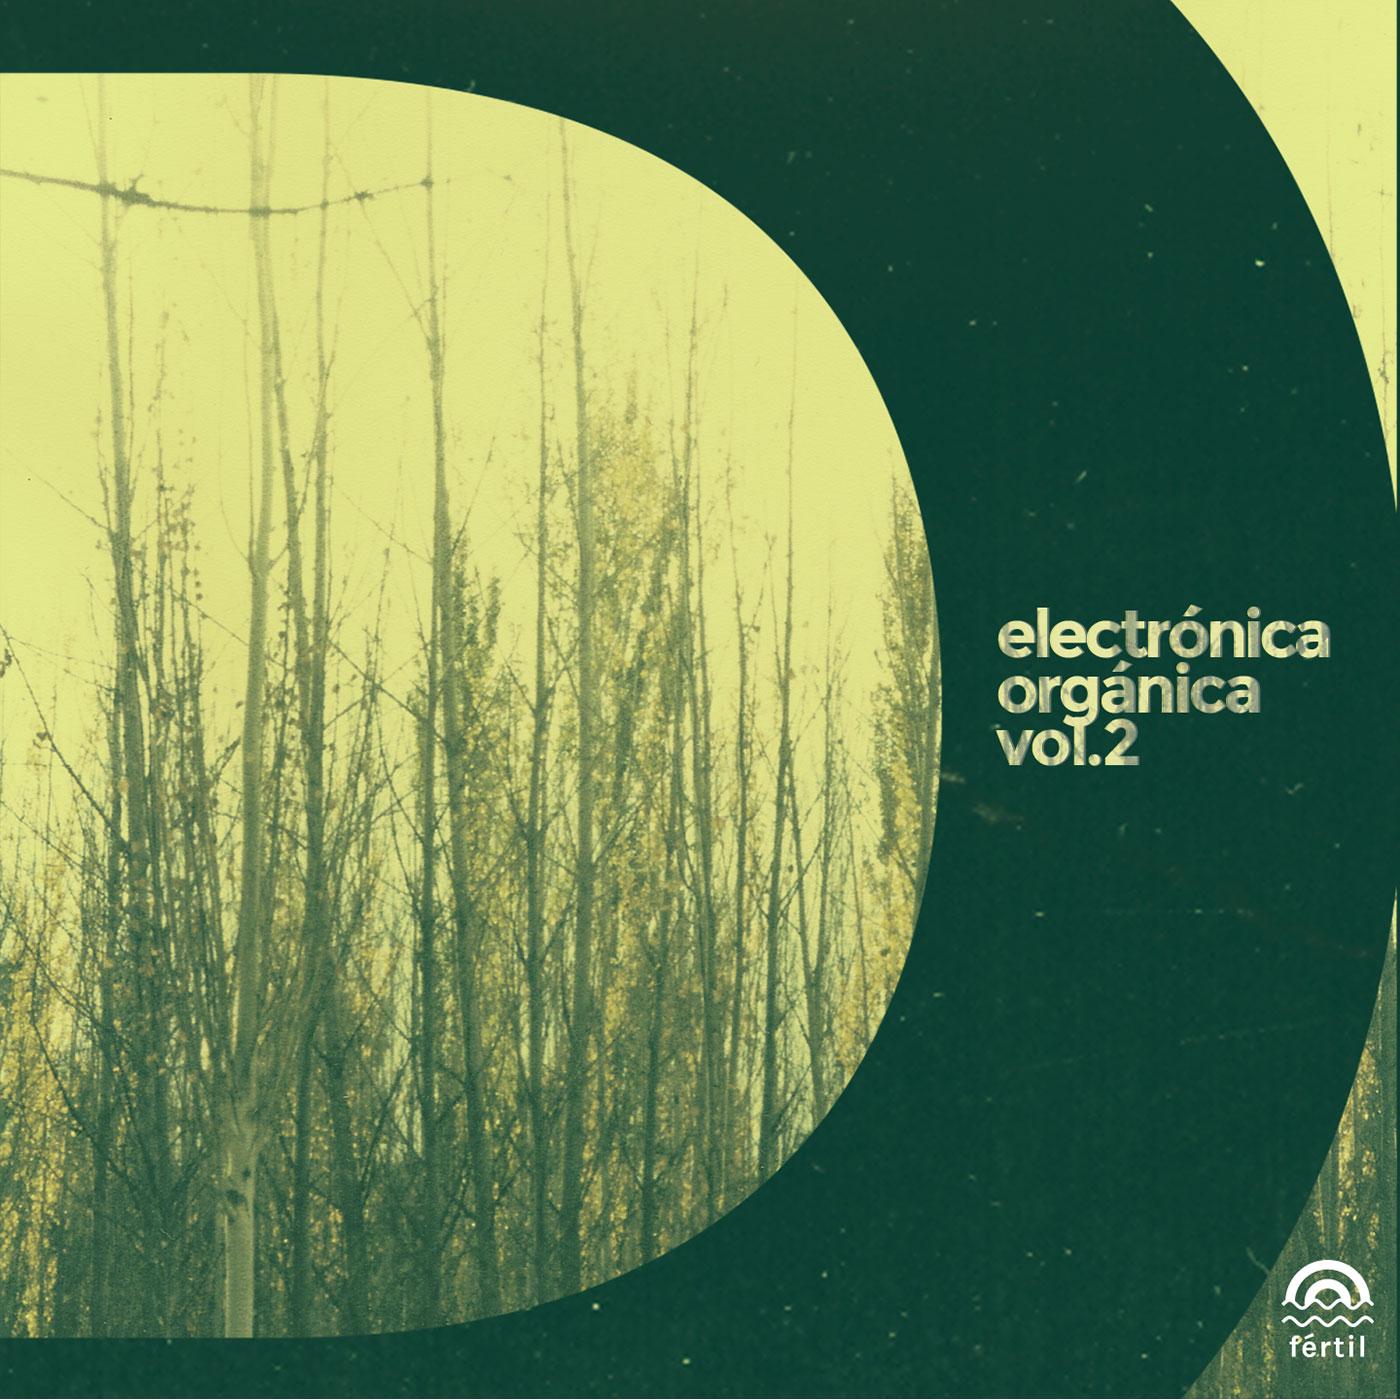 Electrónica Orgánica – Vol. 2: Día